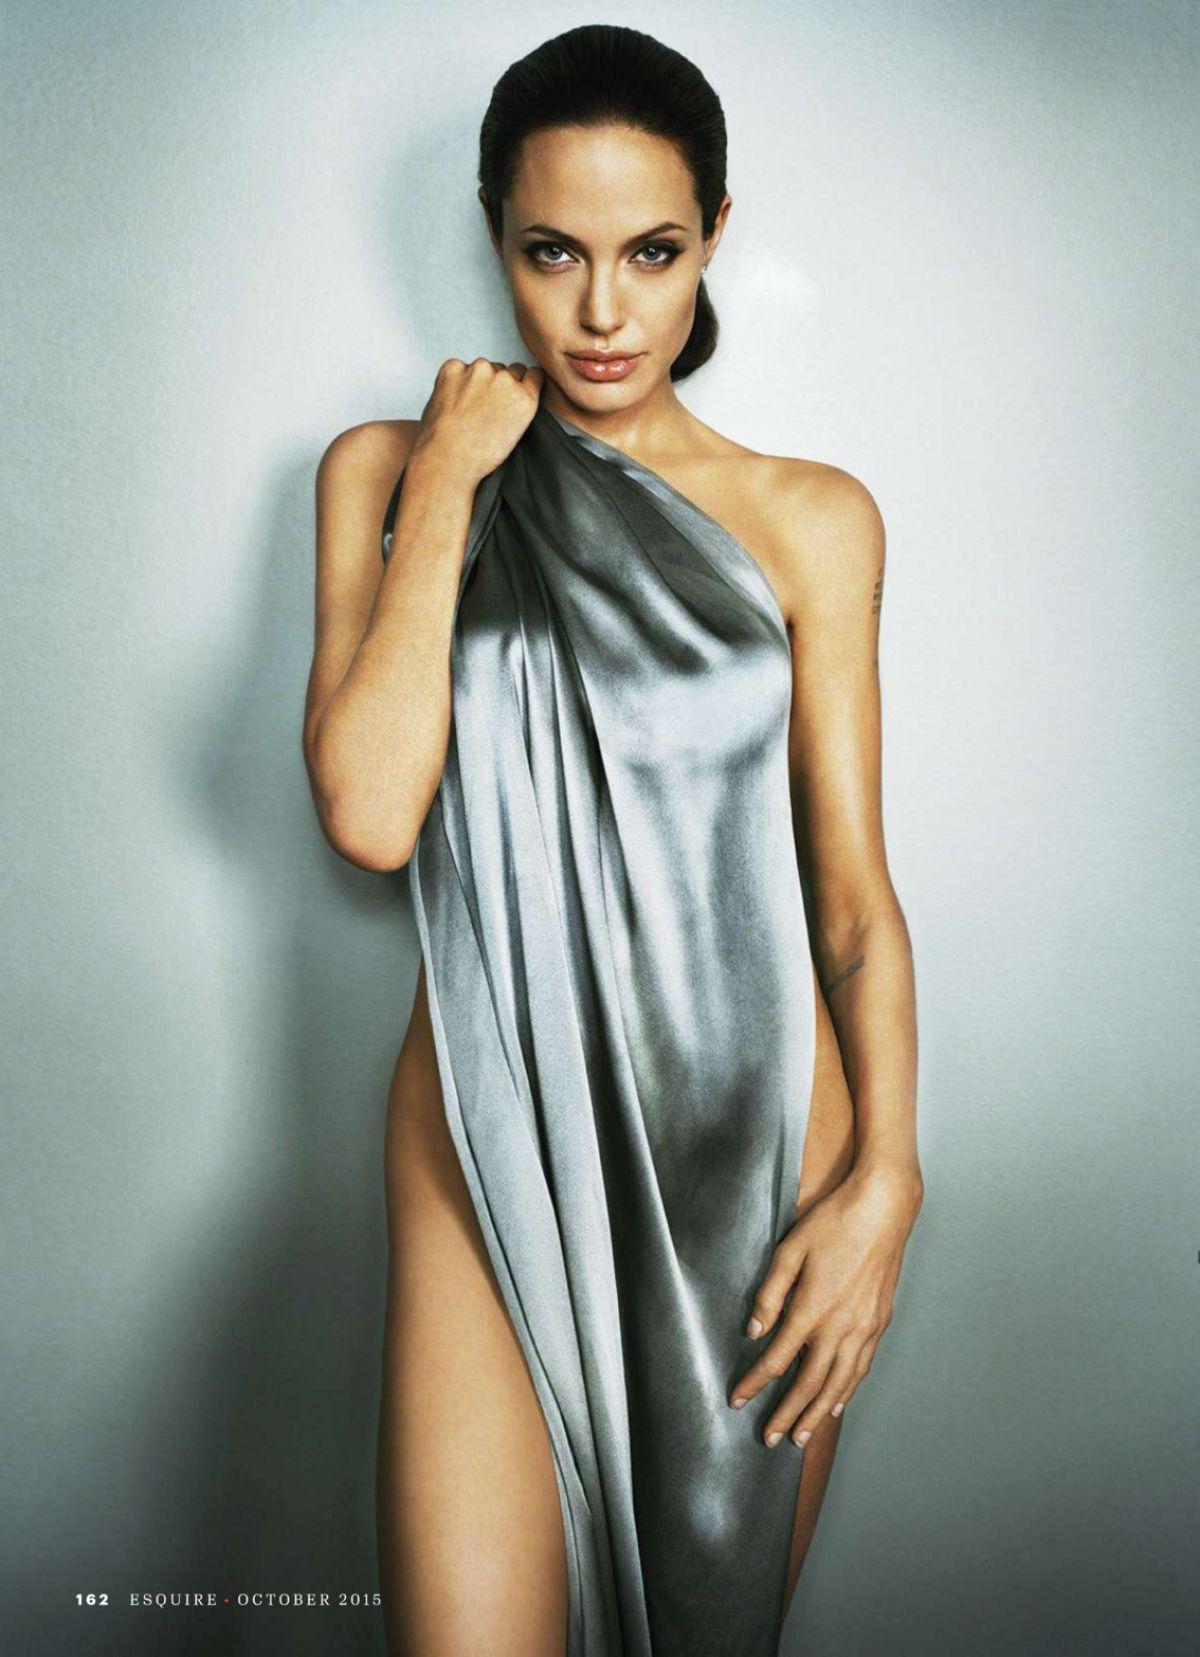 Hot models nude Nude Photos